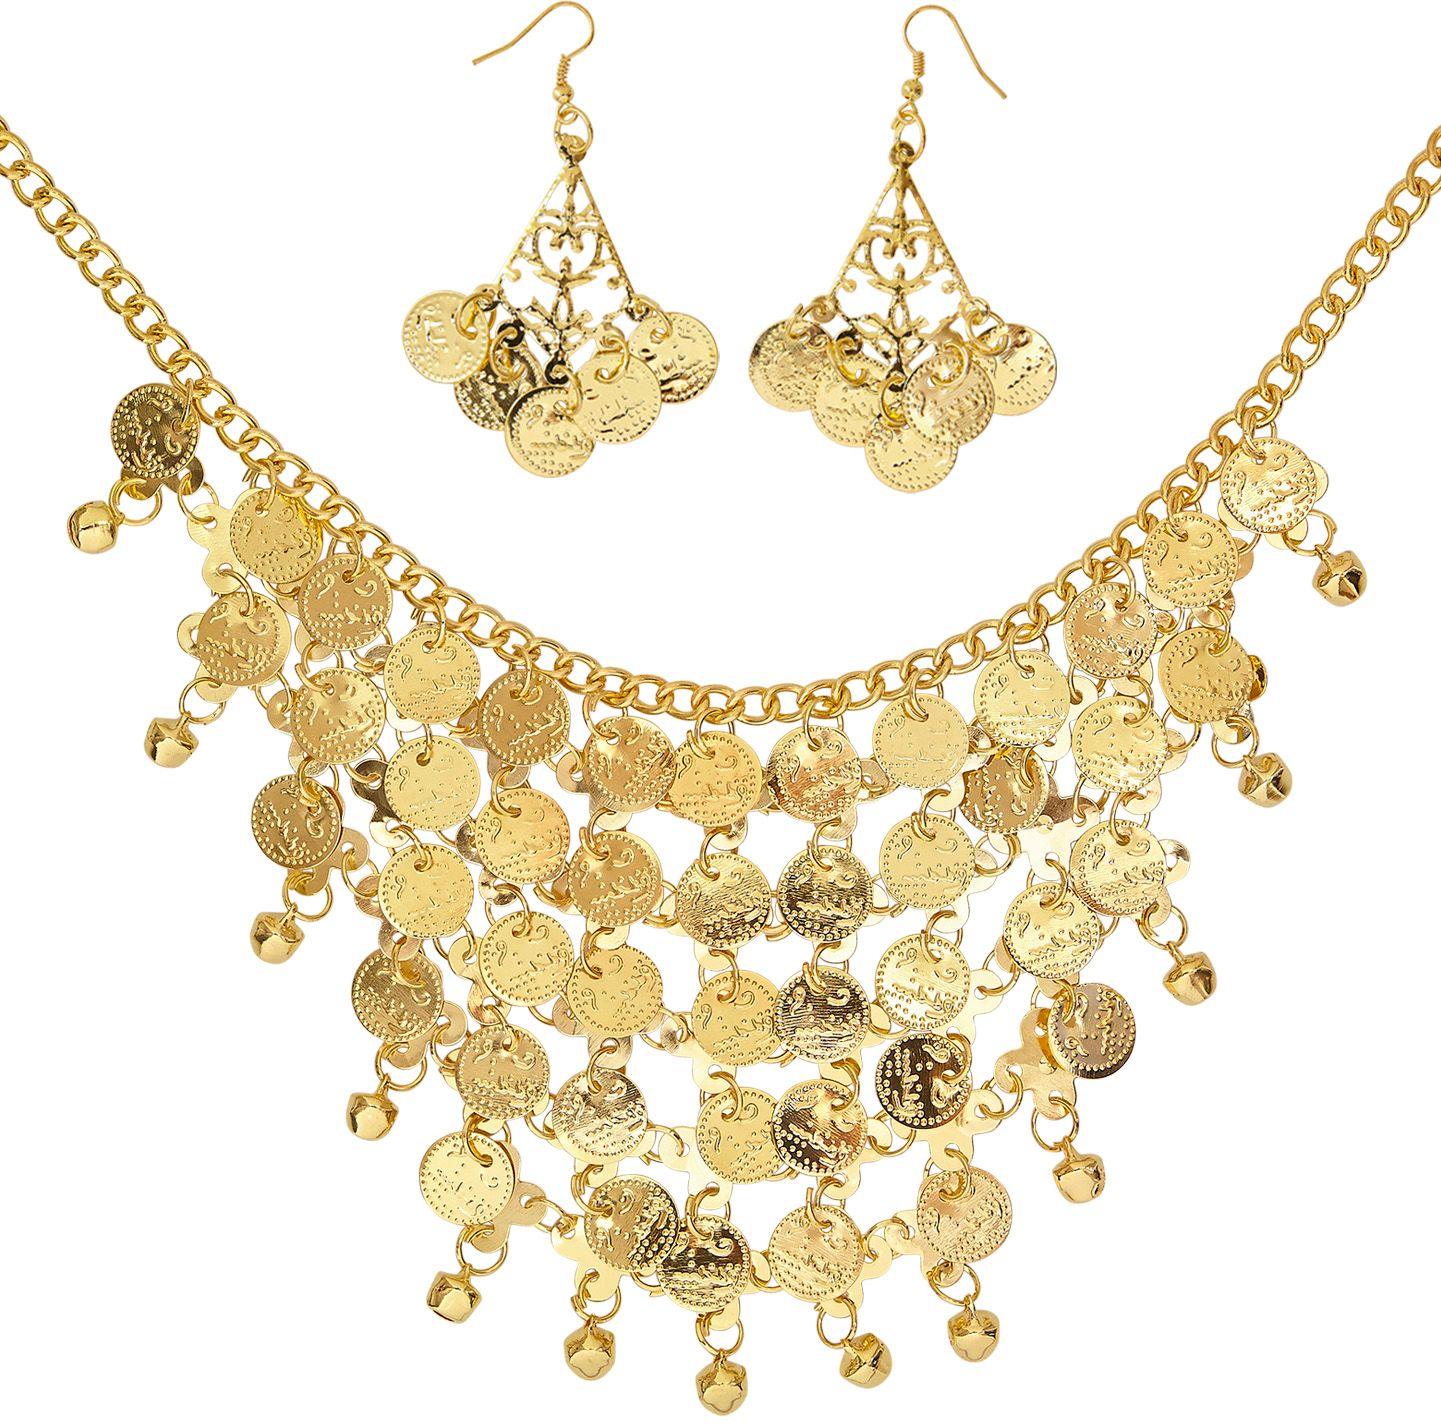 Ketting met oorbellen en muntjes goud